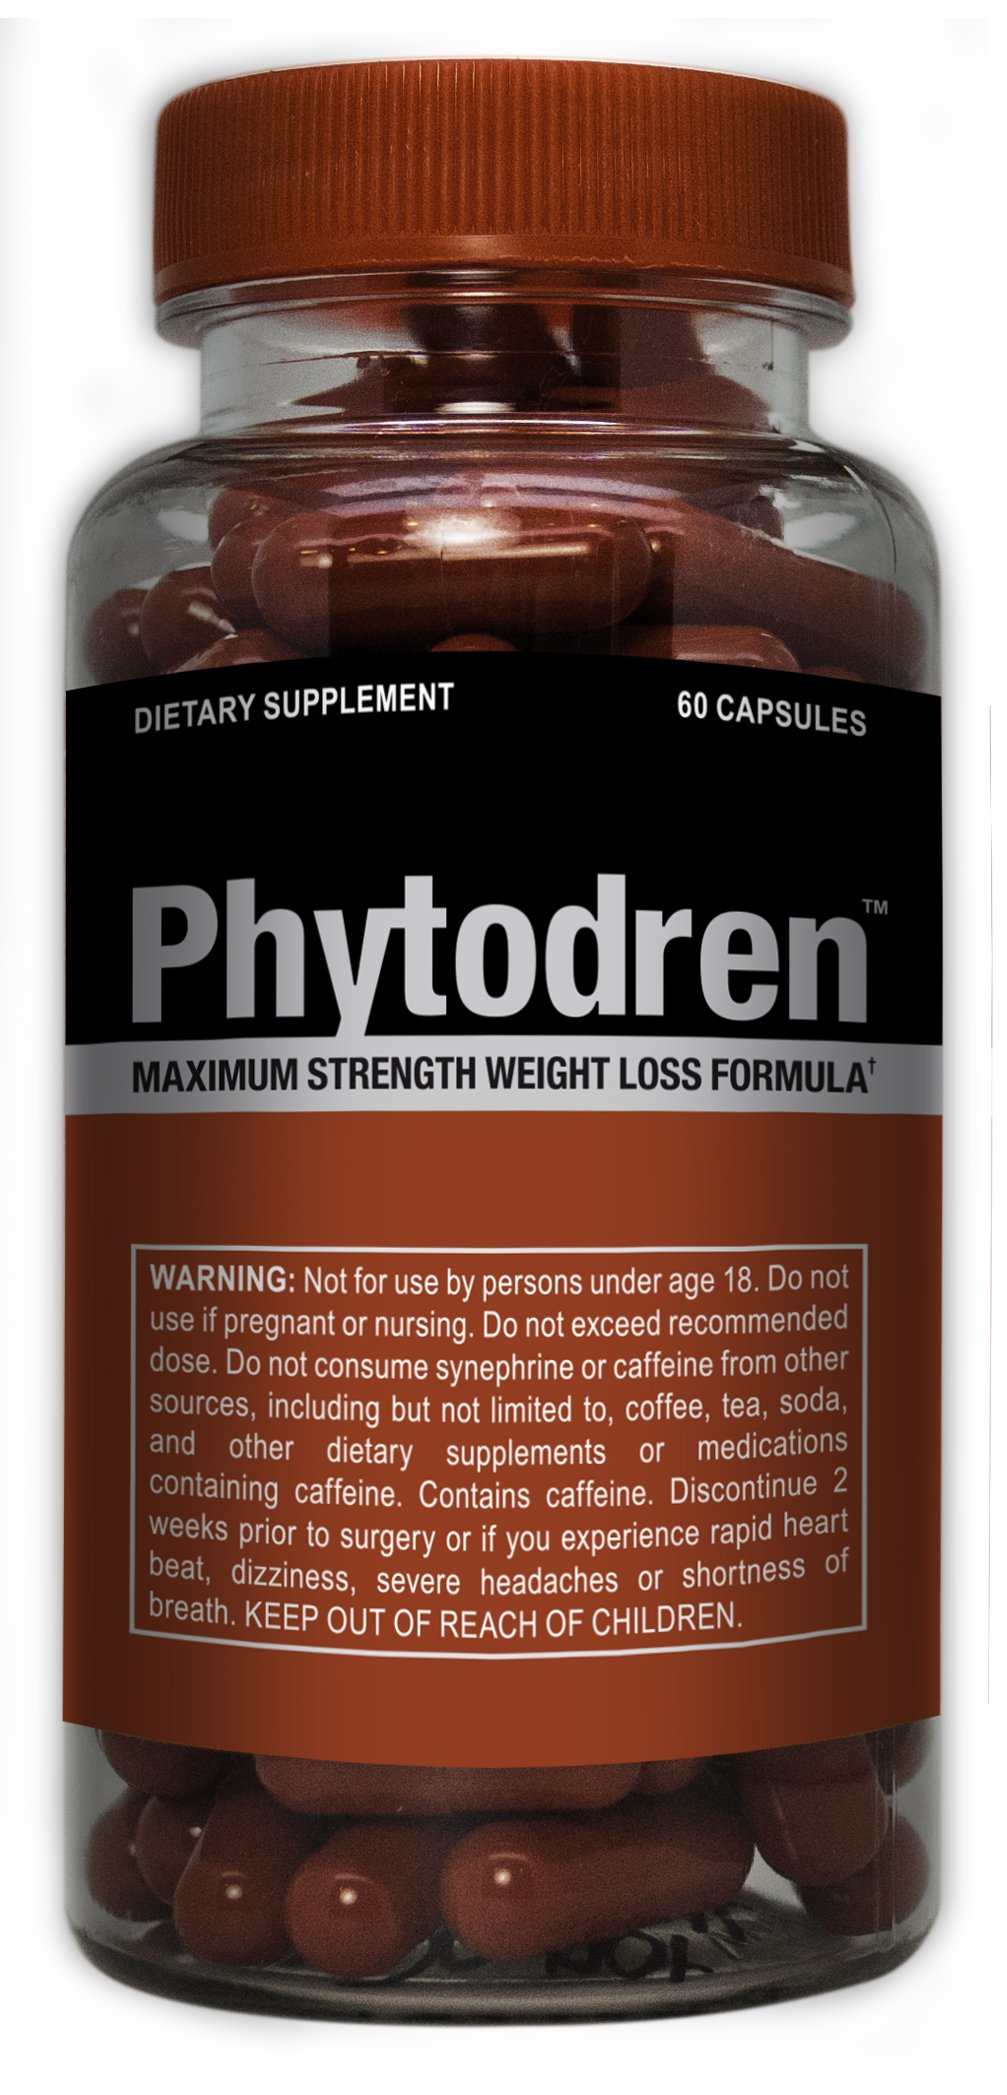 Phytodren - Hardcore Weight Loss - Burn Fat - Boost Energy Levels - Eat Less